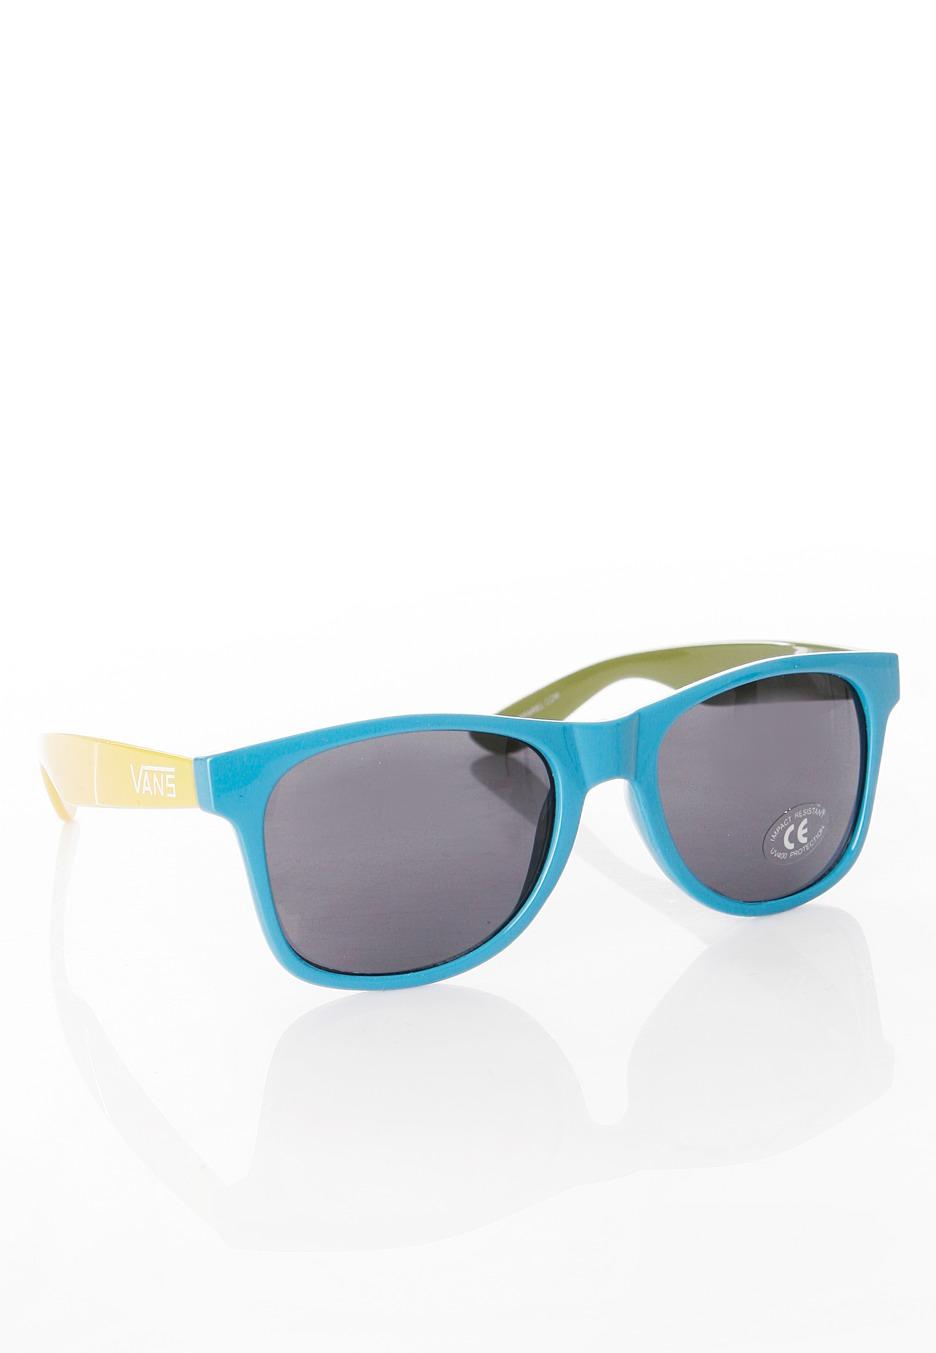 e523bc725c Vans - Spicoli 4 Shades Pear Malibu Blue Lemon Chrome - Sunglasses -  Impericon.com UK